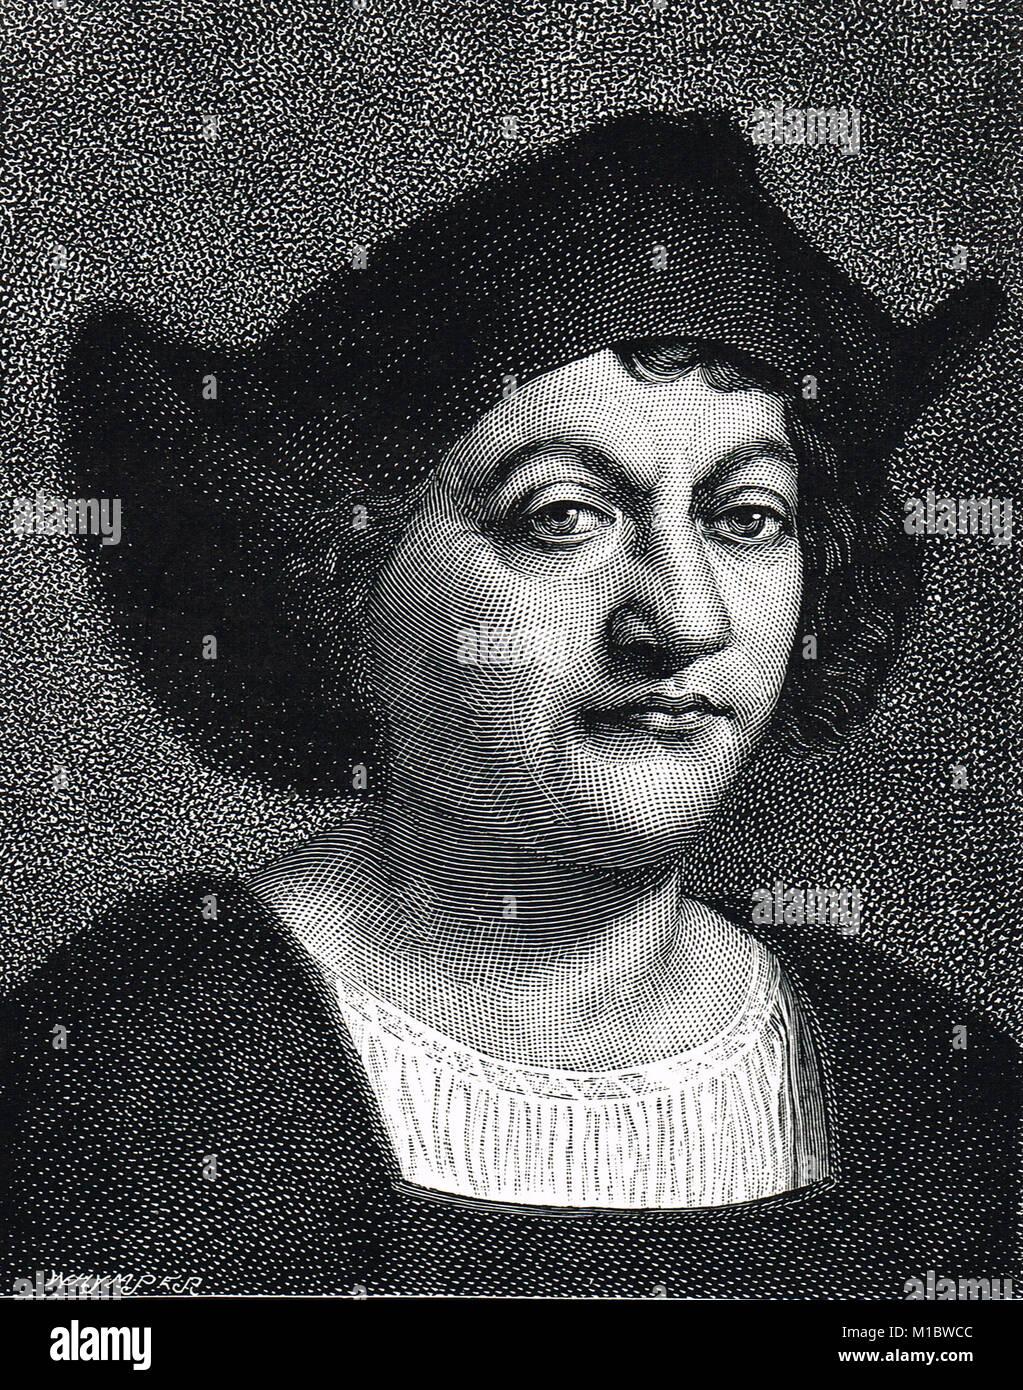 Christopher Columbus, 1451-1506 - Stock Image